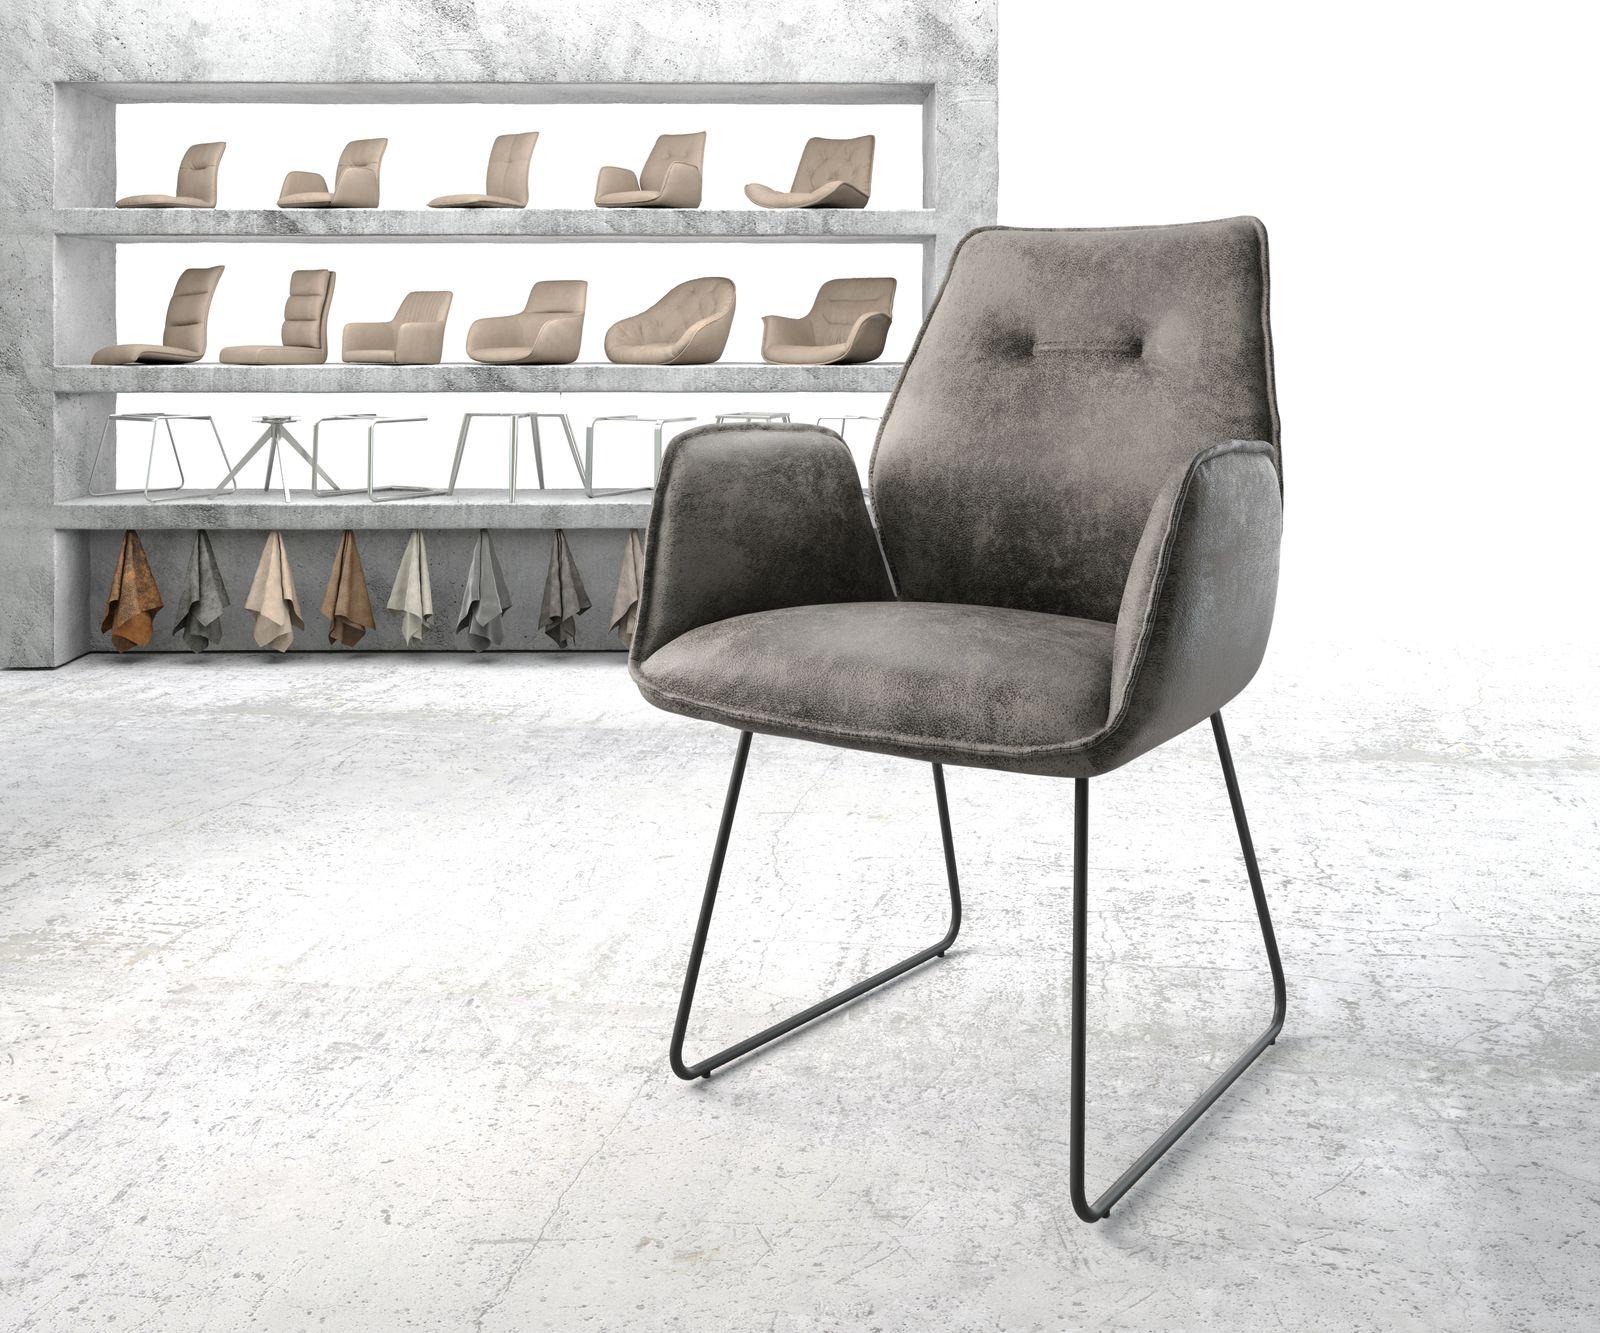 delife-esszimmerstuhl-zoa-flex-grau-microvelours-kufengestell-schwarz-esszimmerstuhle